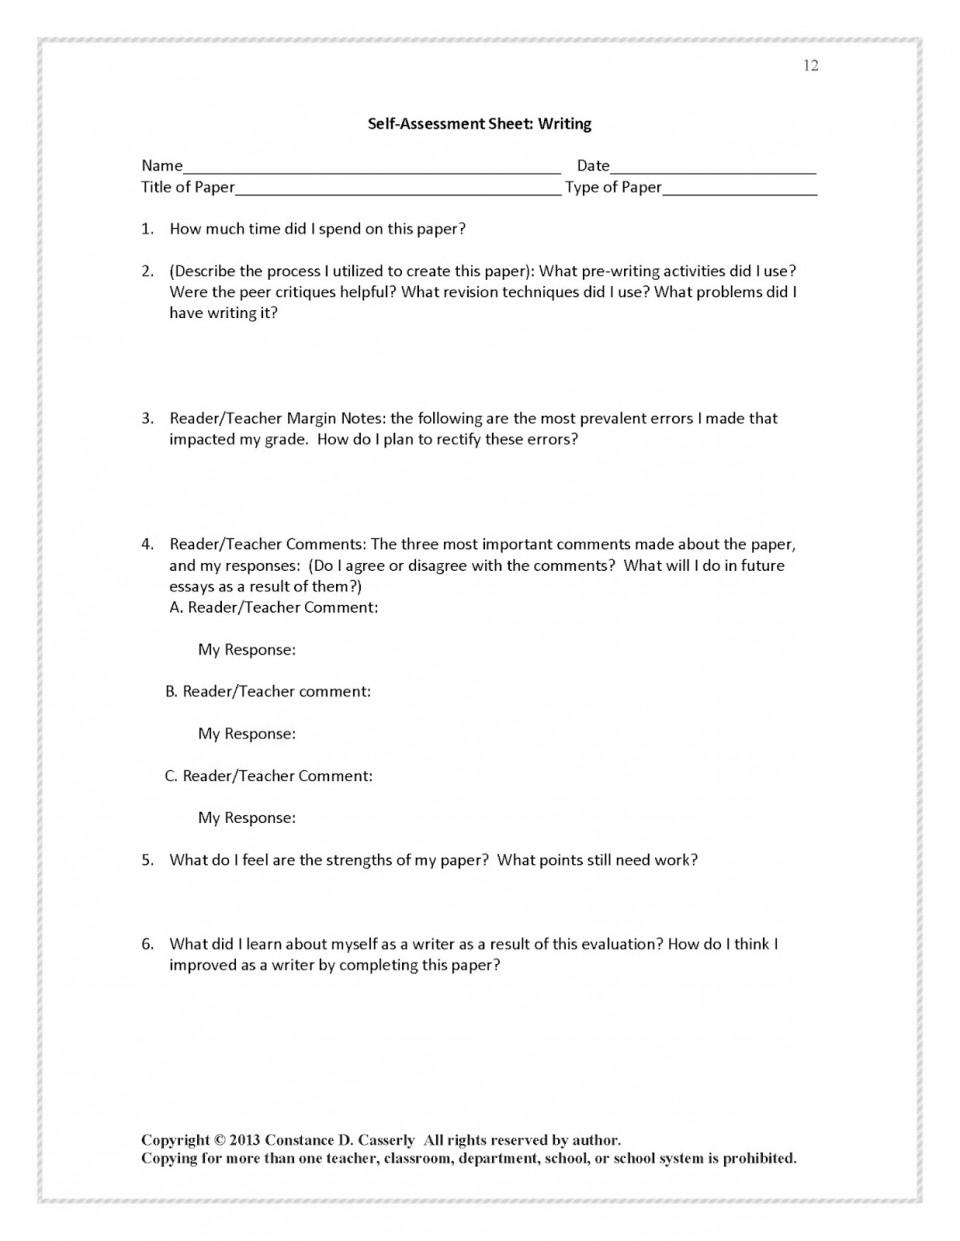 Evaluative essay structure